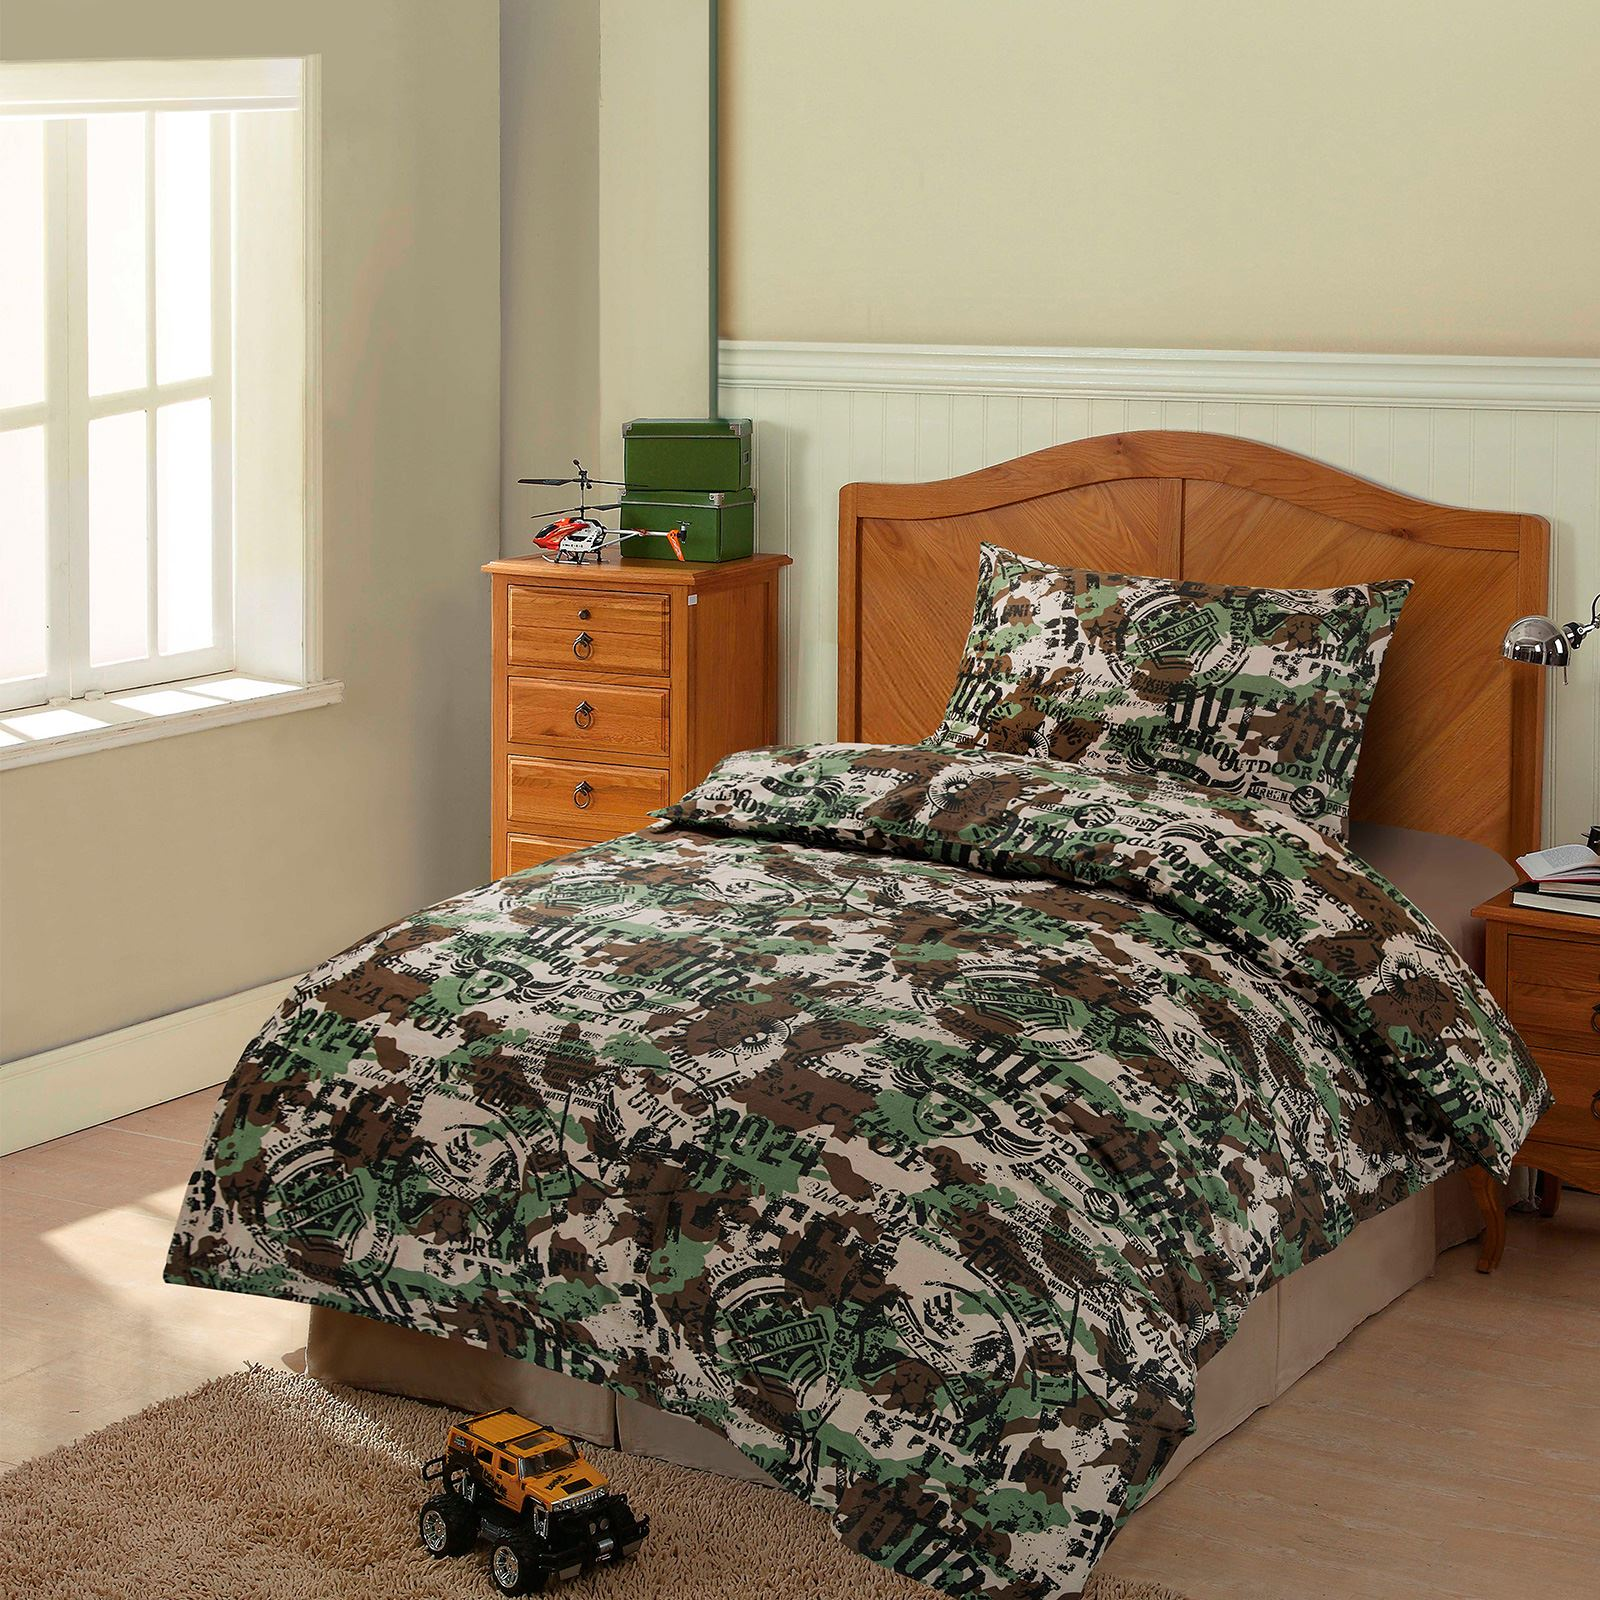 bedroom sets kids boys girls. childrenteenagekidsboysgirlssinglequiltduvet bedroom sets kids boys girls